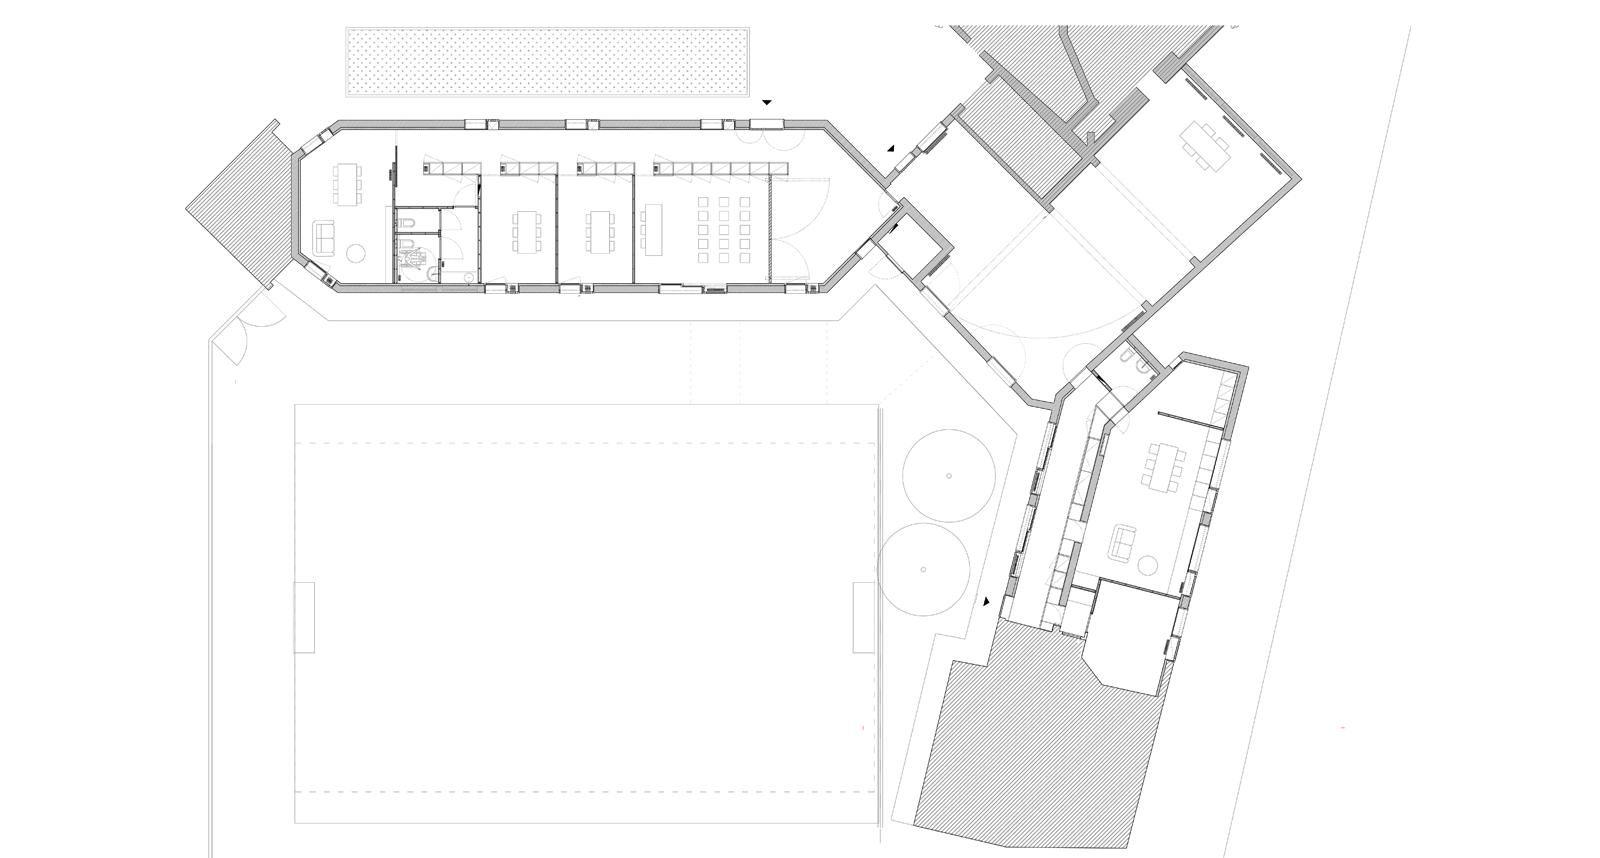 parrocchia-immacolata-plan-project